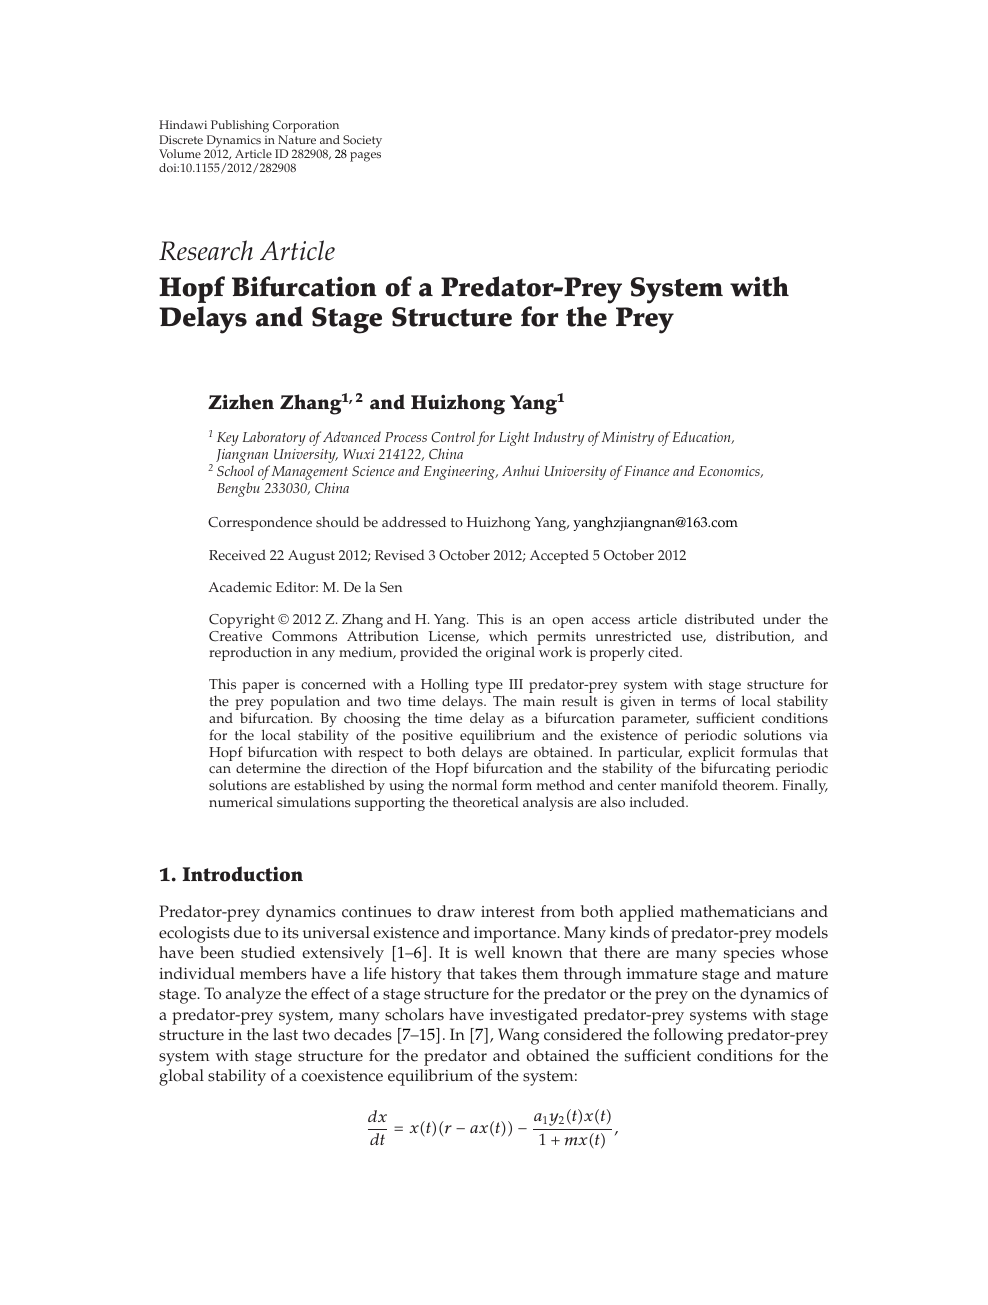 Hopf Bifurcation of a Predator-Prey System with Delays and Stage